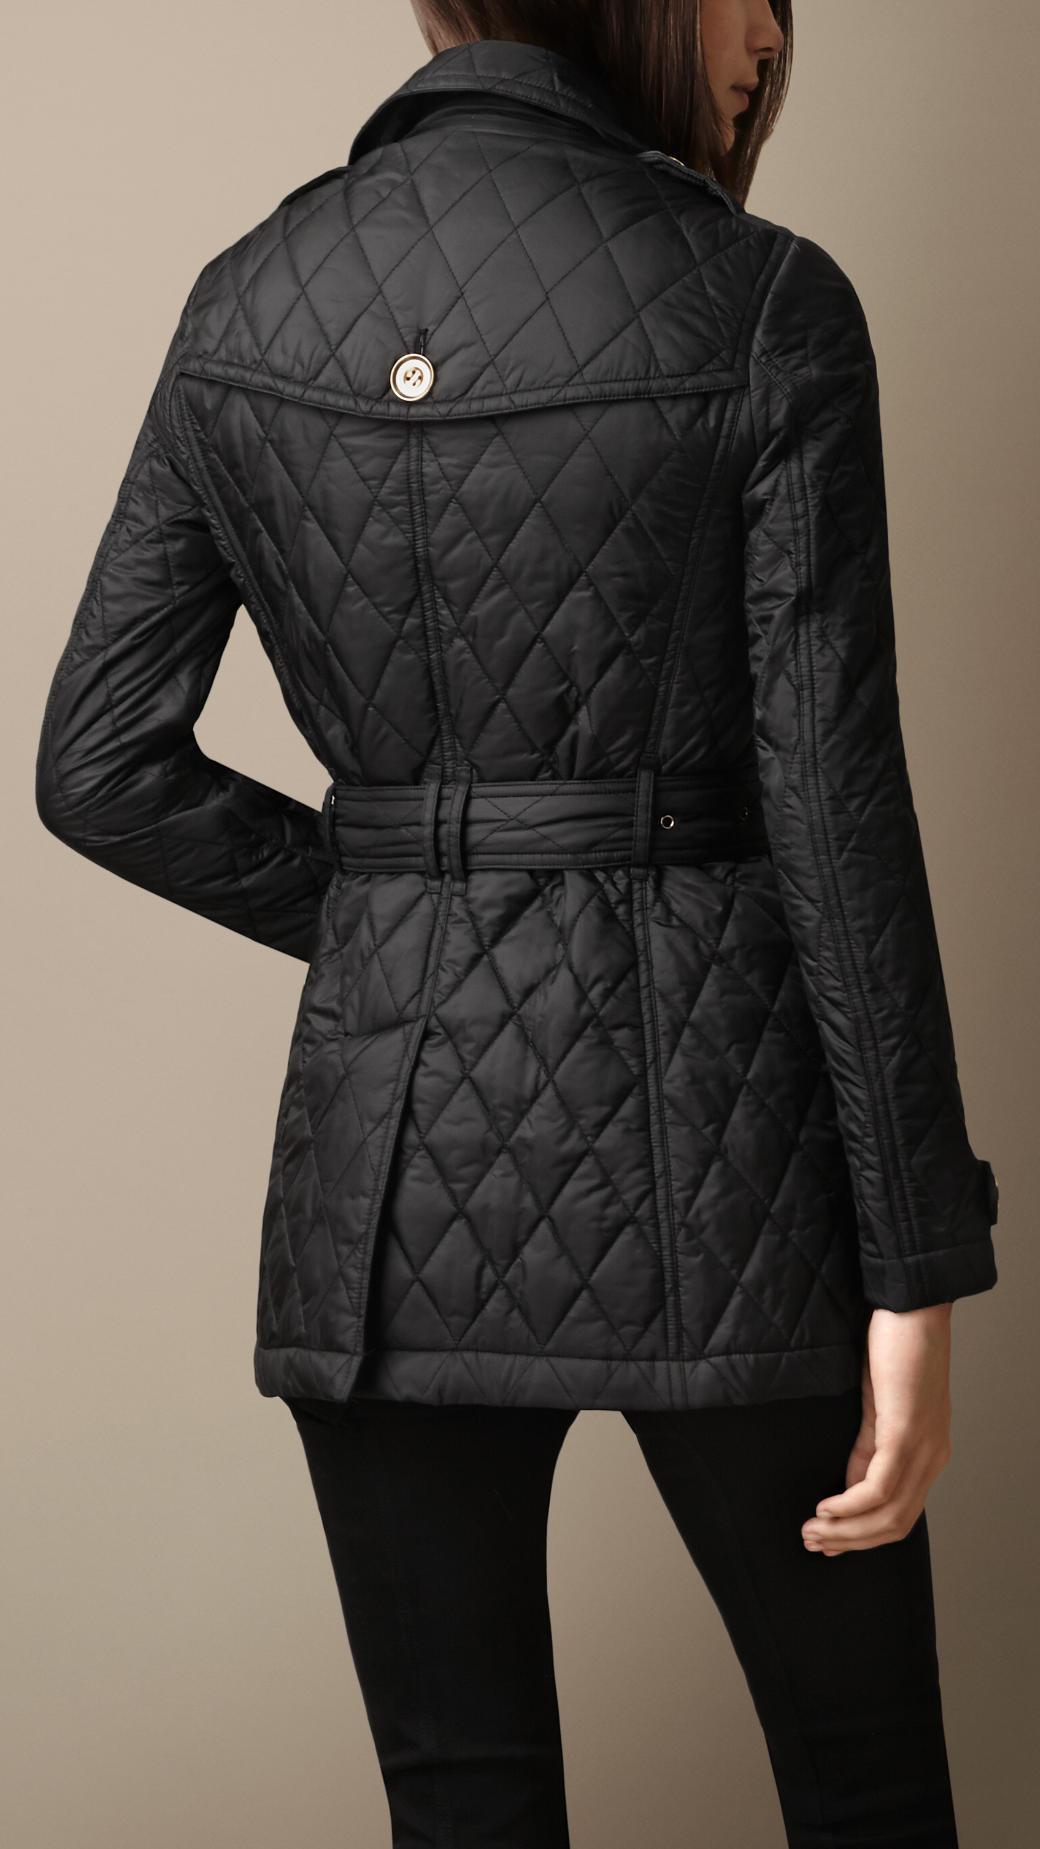 Burberry Heritage Diamond Quilted Coat in Black | Lyst : burberry diamond quilted jacket sale - Adamdwight.com